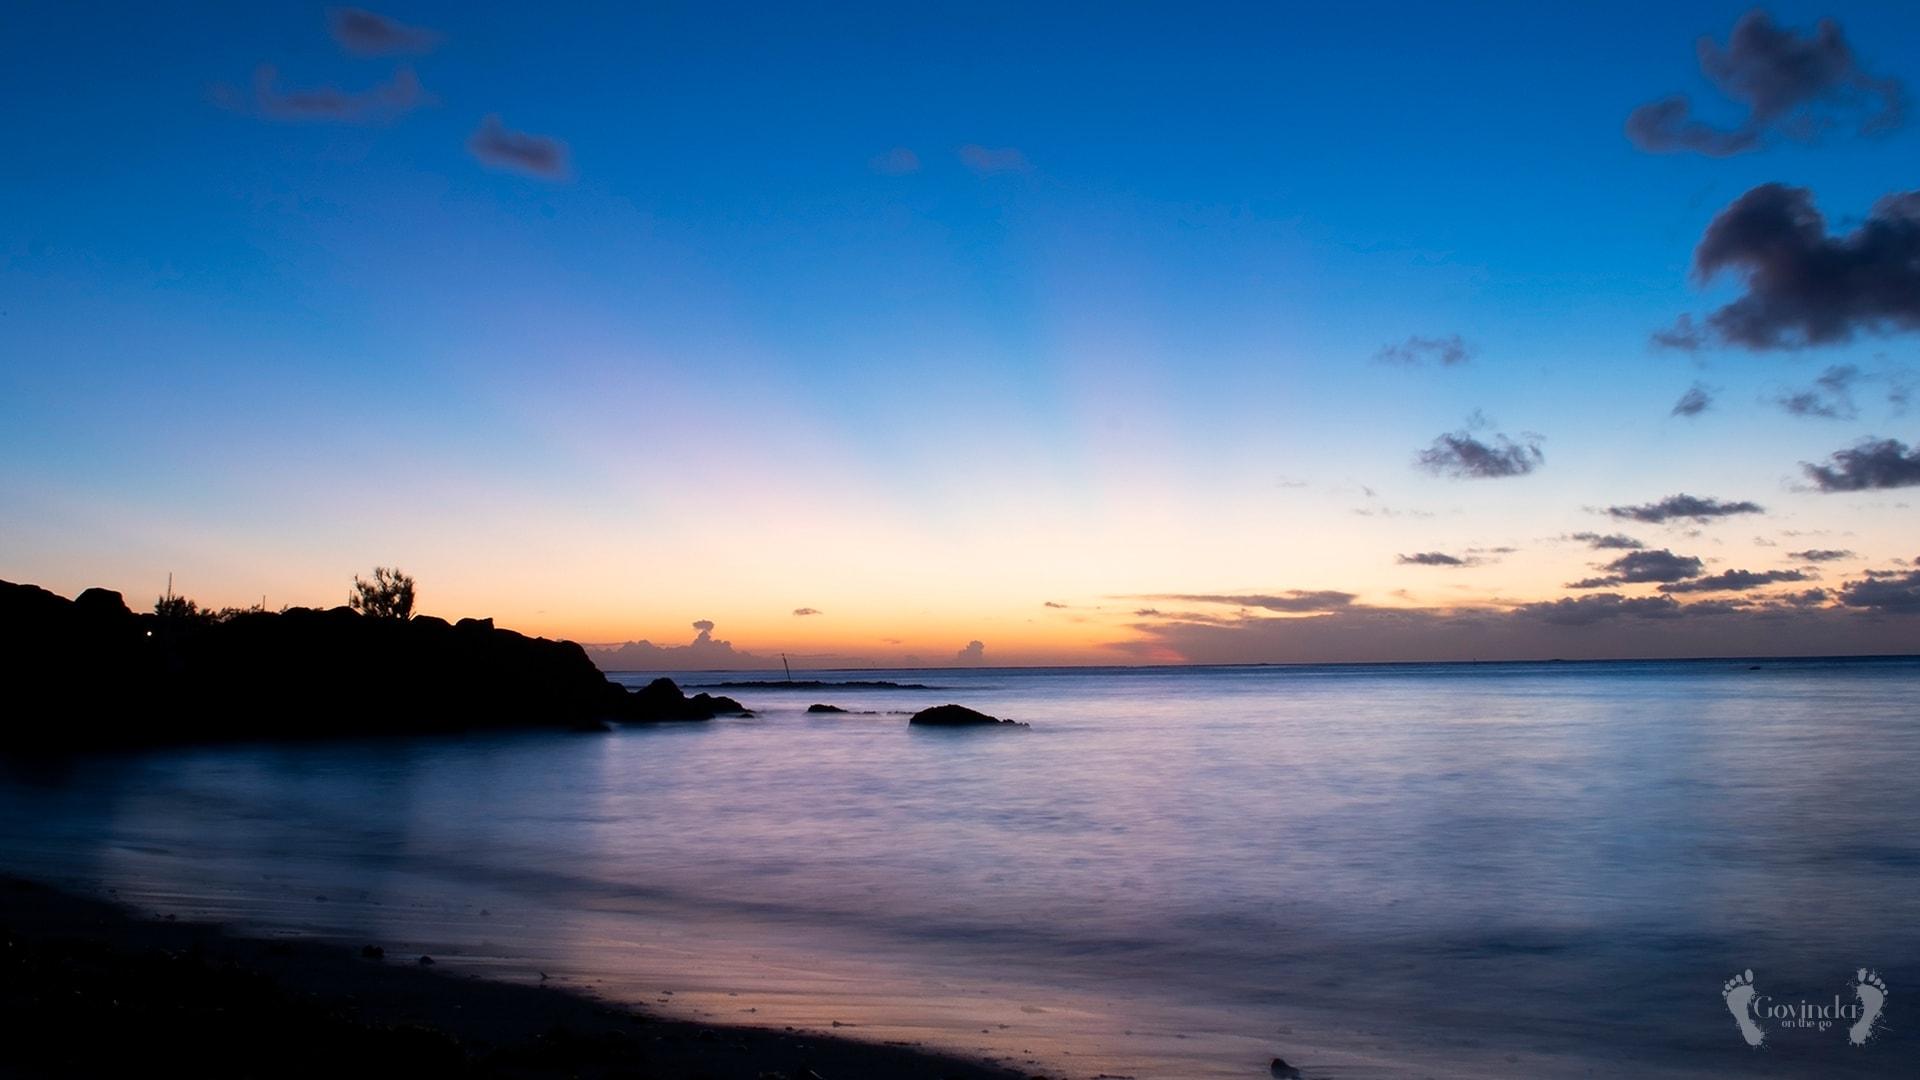 Sunset at Cap Malheureux, Mauritius